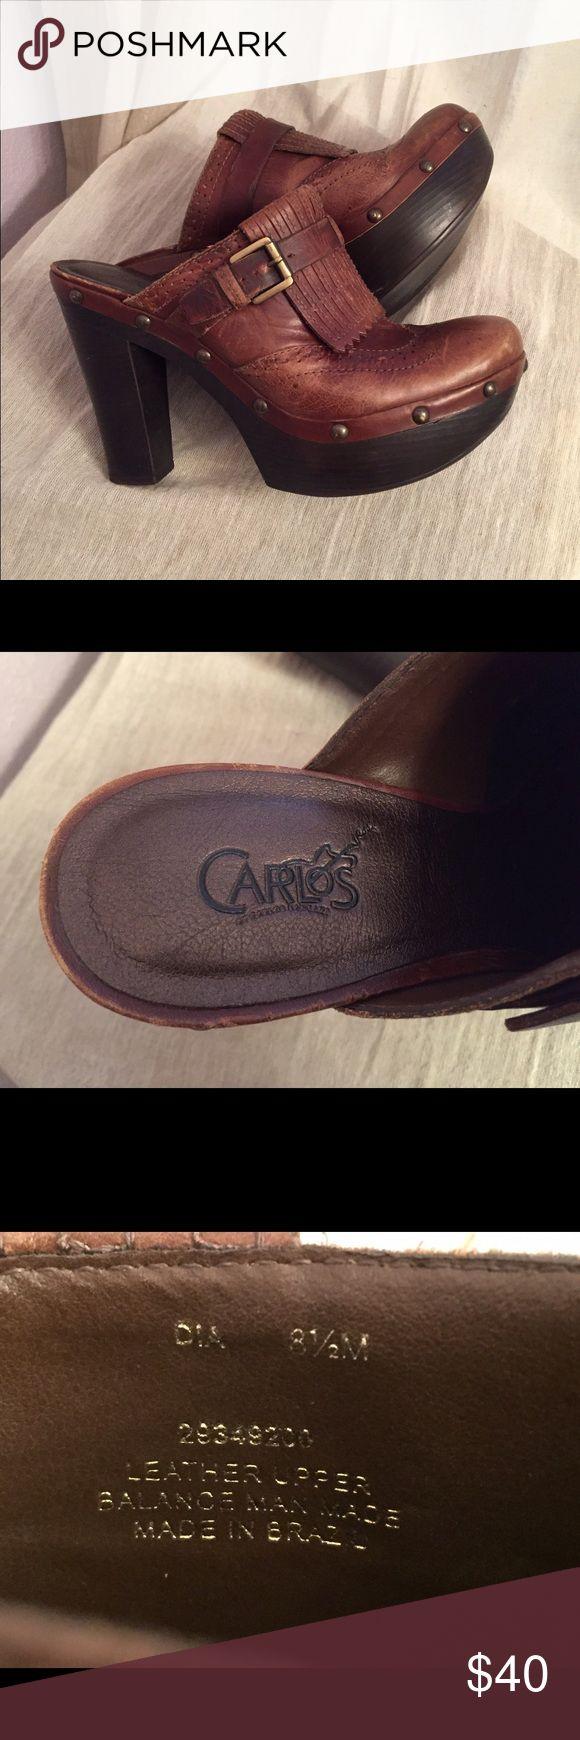 Carlos Santana Leather Clogs. Carlos Santana leather clogs. New. Never worn. Carlos Santana Shoes Mules & Clogs